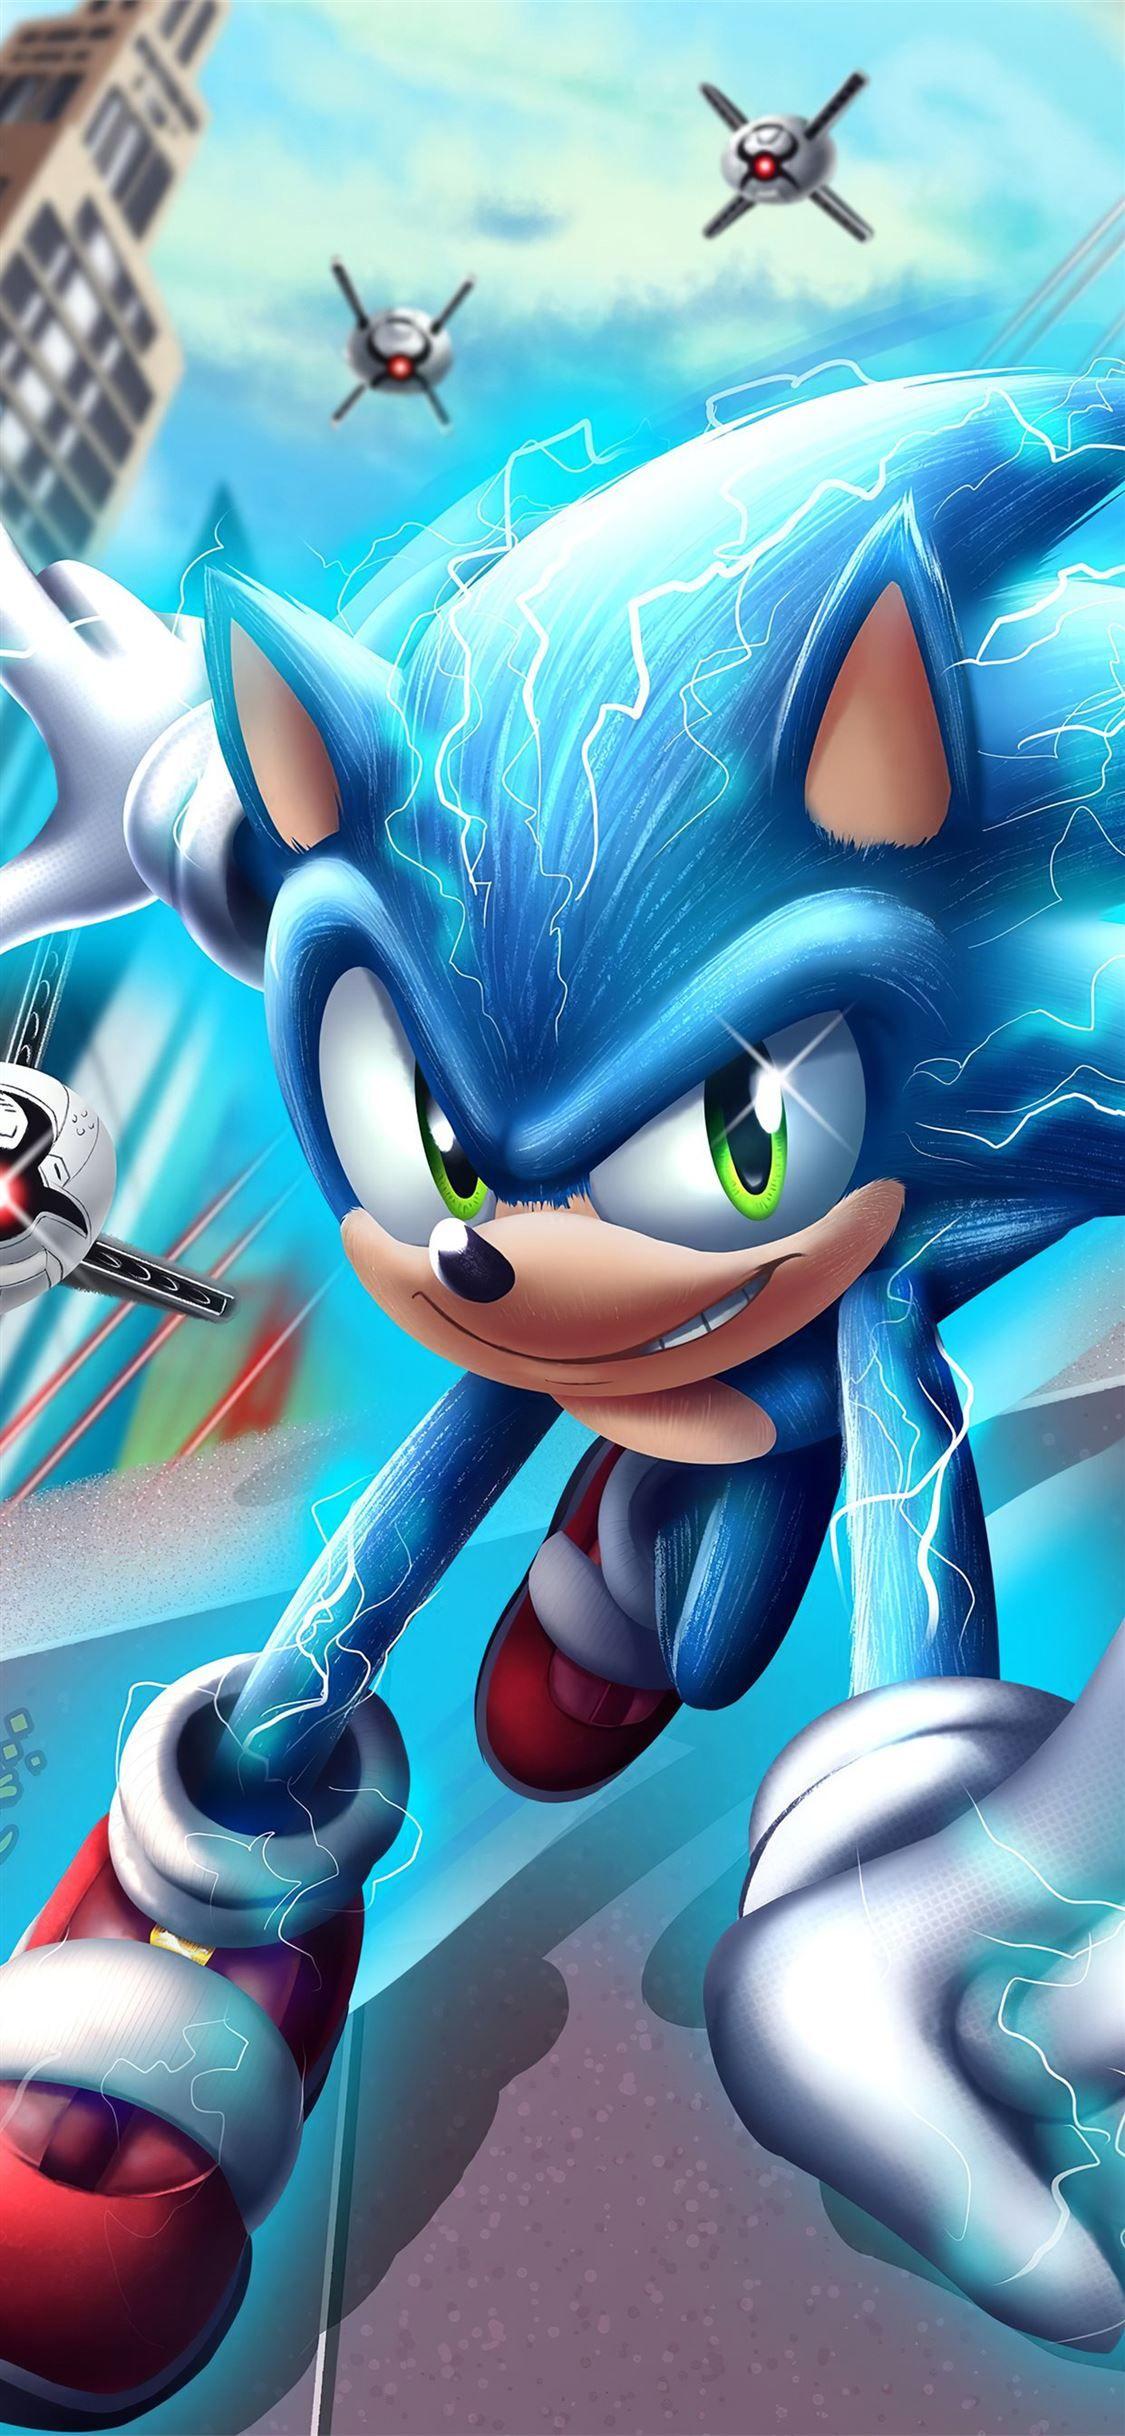 Sonic The Hedgehog 4k 2020 Sonicthehedgehog Movies 2020movies 4k Sonic Deviantart Iphone11wallpaper In 2020 Sonic The Hedgehog Hedgehog Sonic